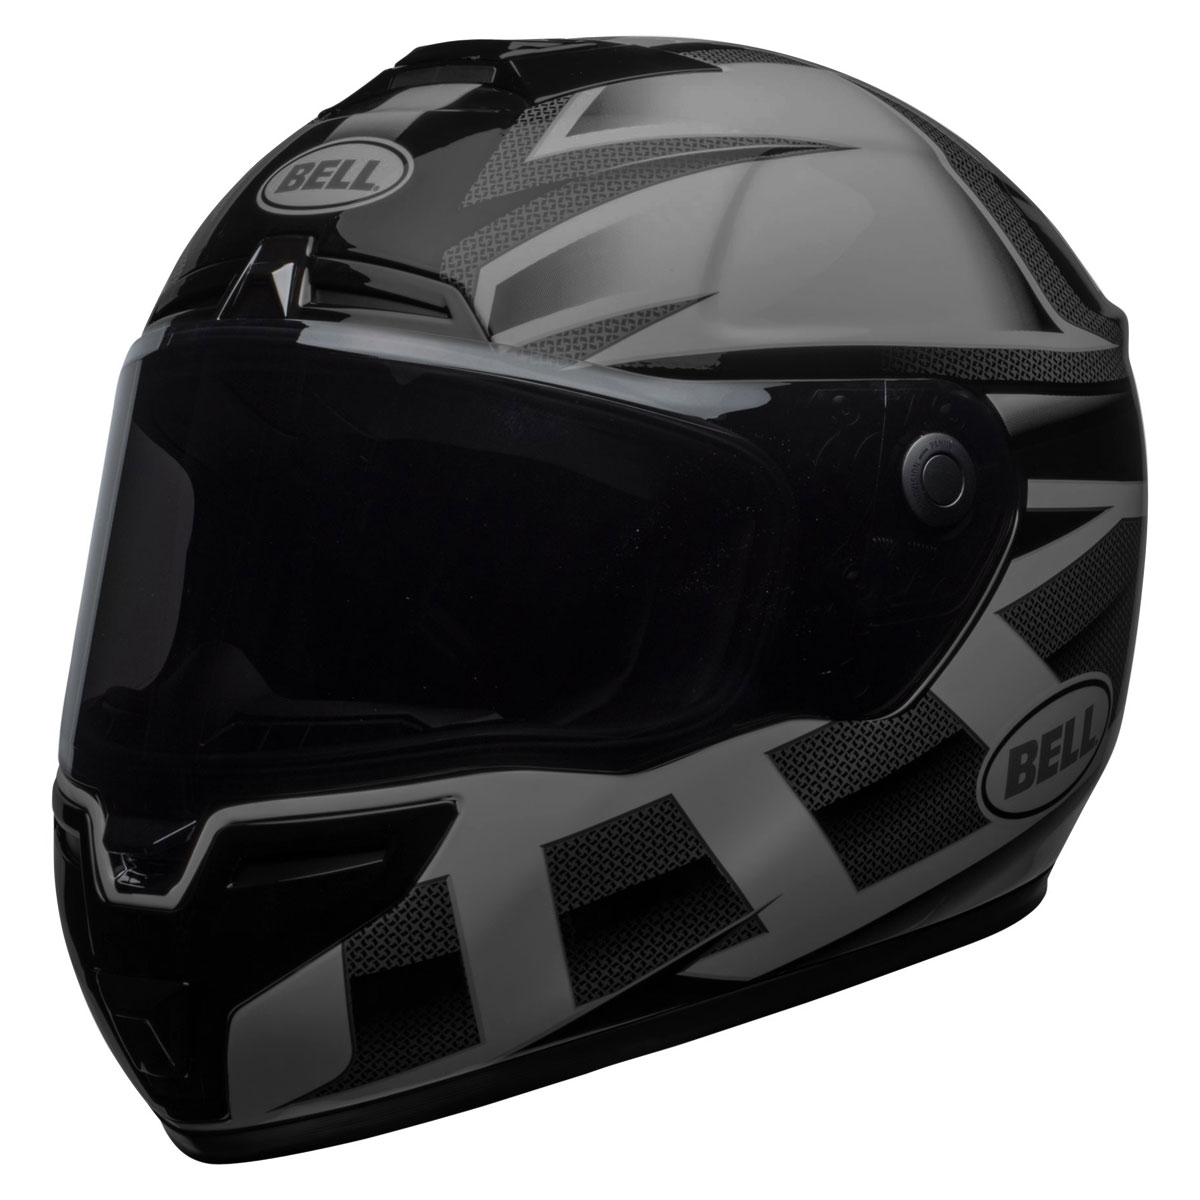 f4f600a6 Bell SRT Blackout Predator Matte/Gloss Full Face Helmet - 7095595 ...